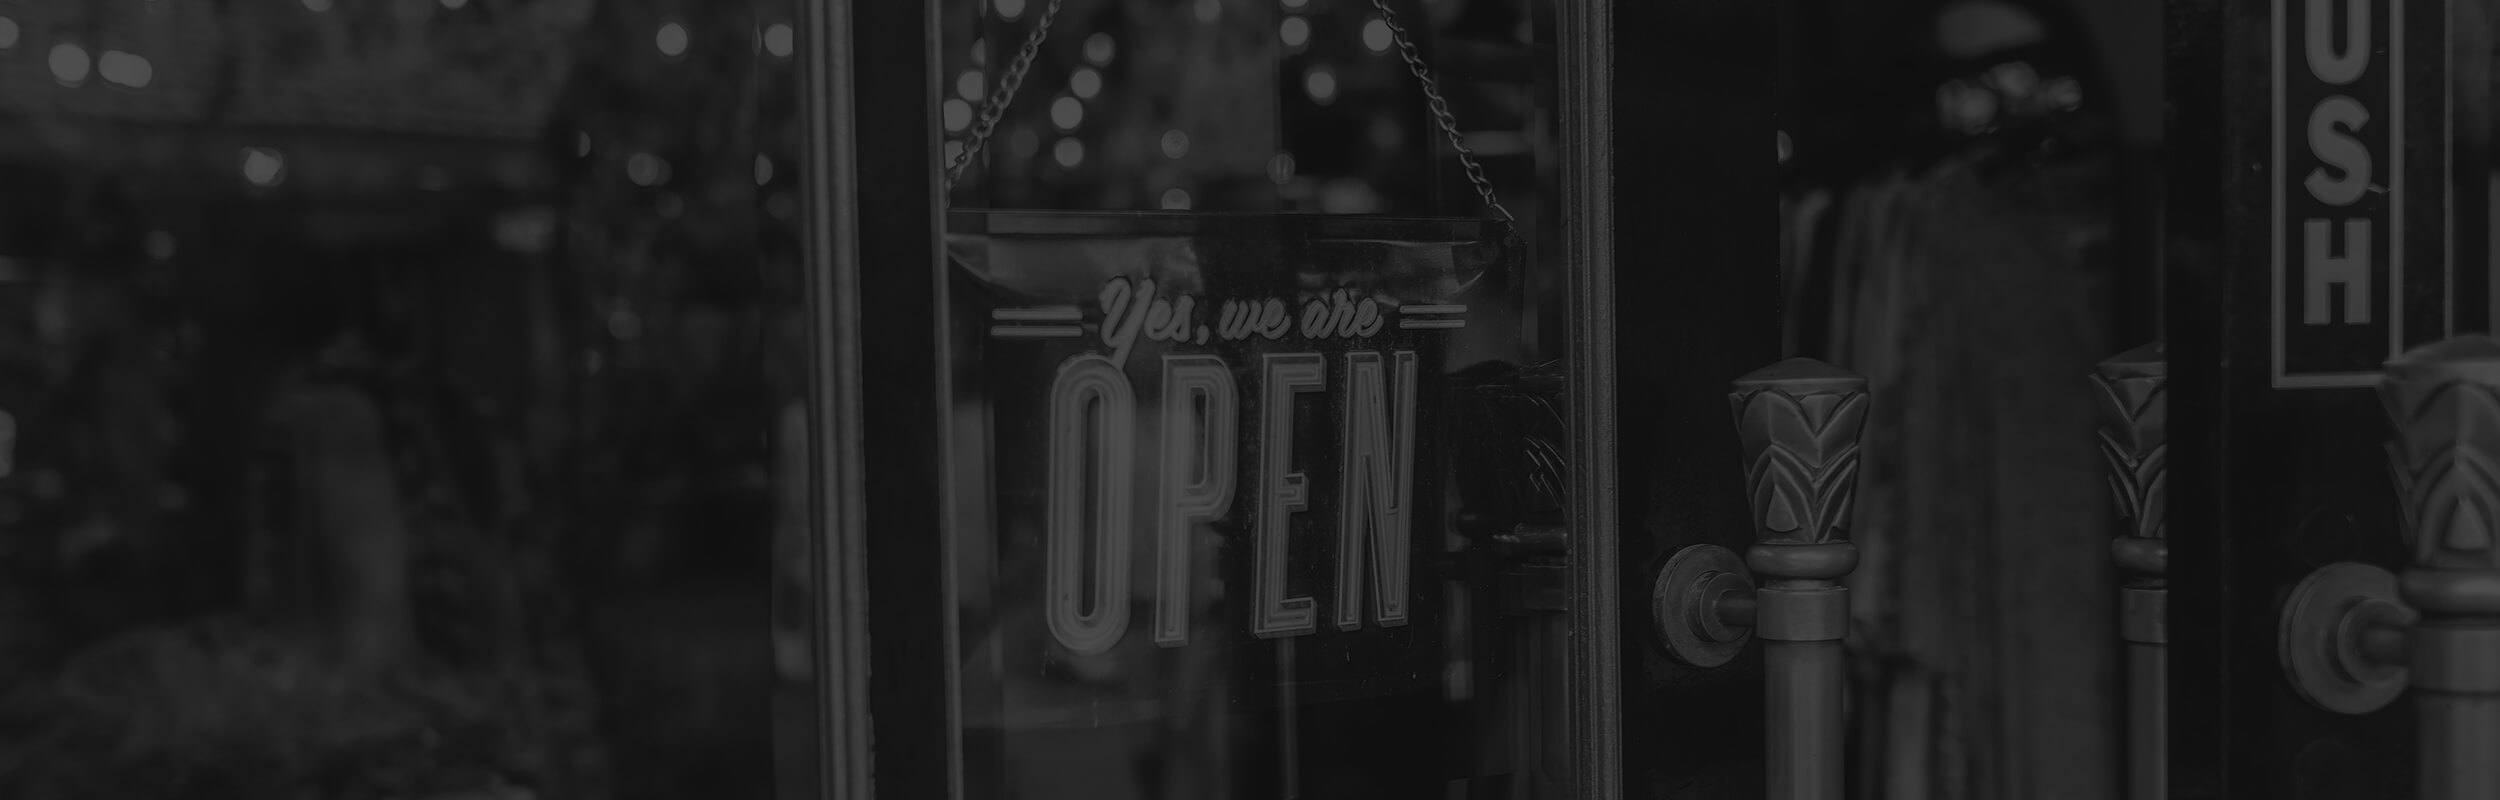 Nápis Open